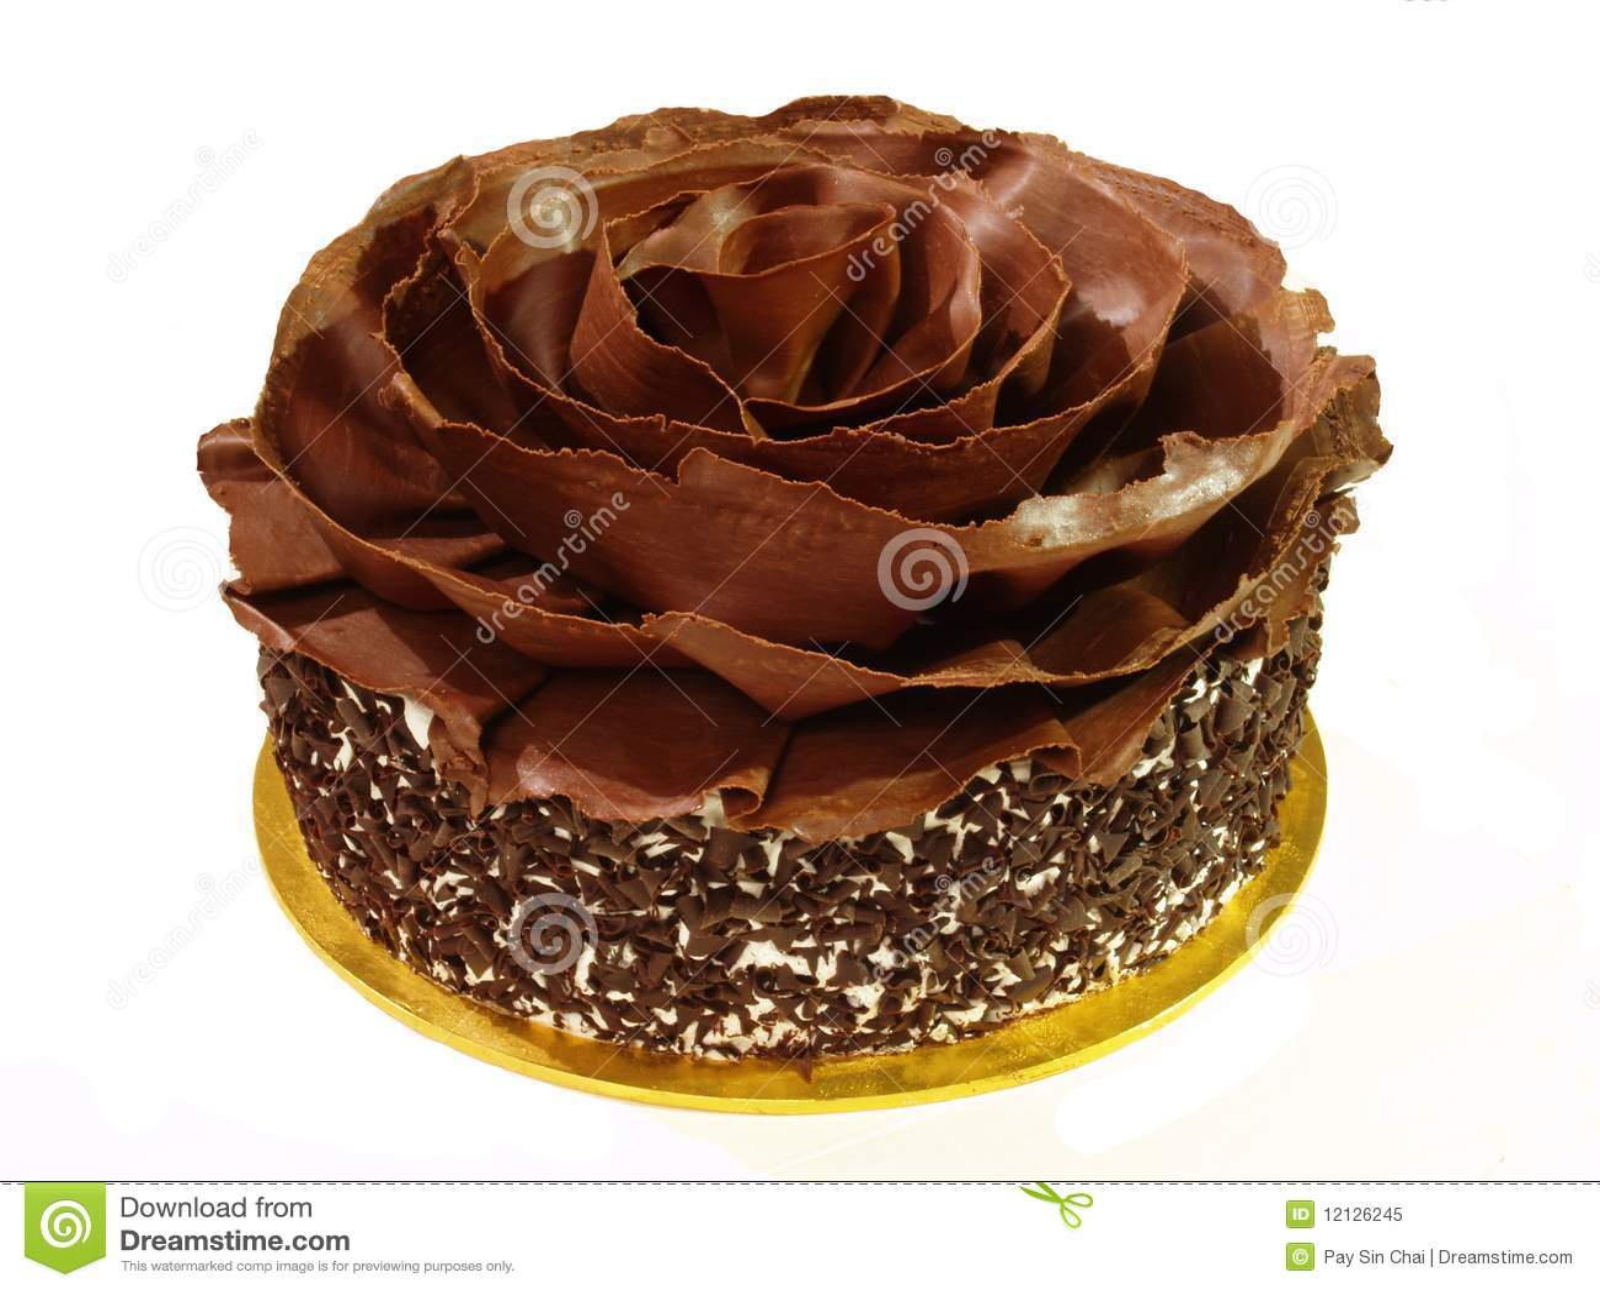 Black Forest Gateau Stock Image Image Of Cake Anniversary 12126245